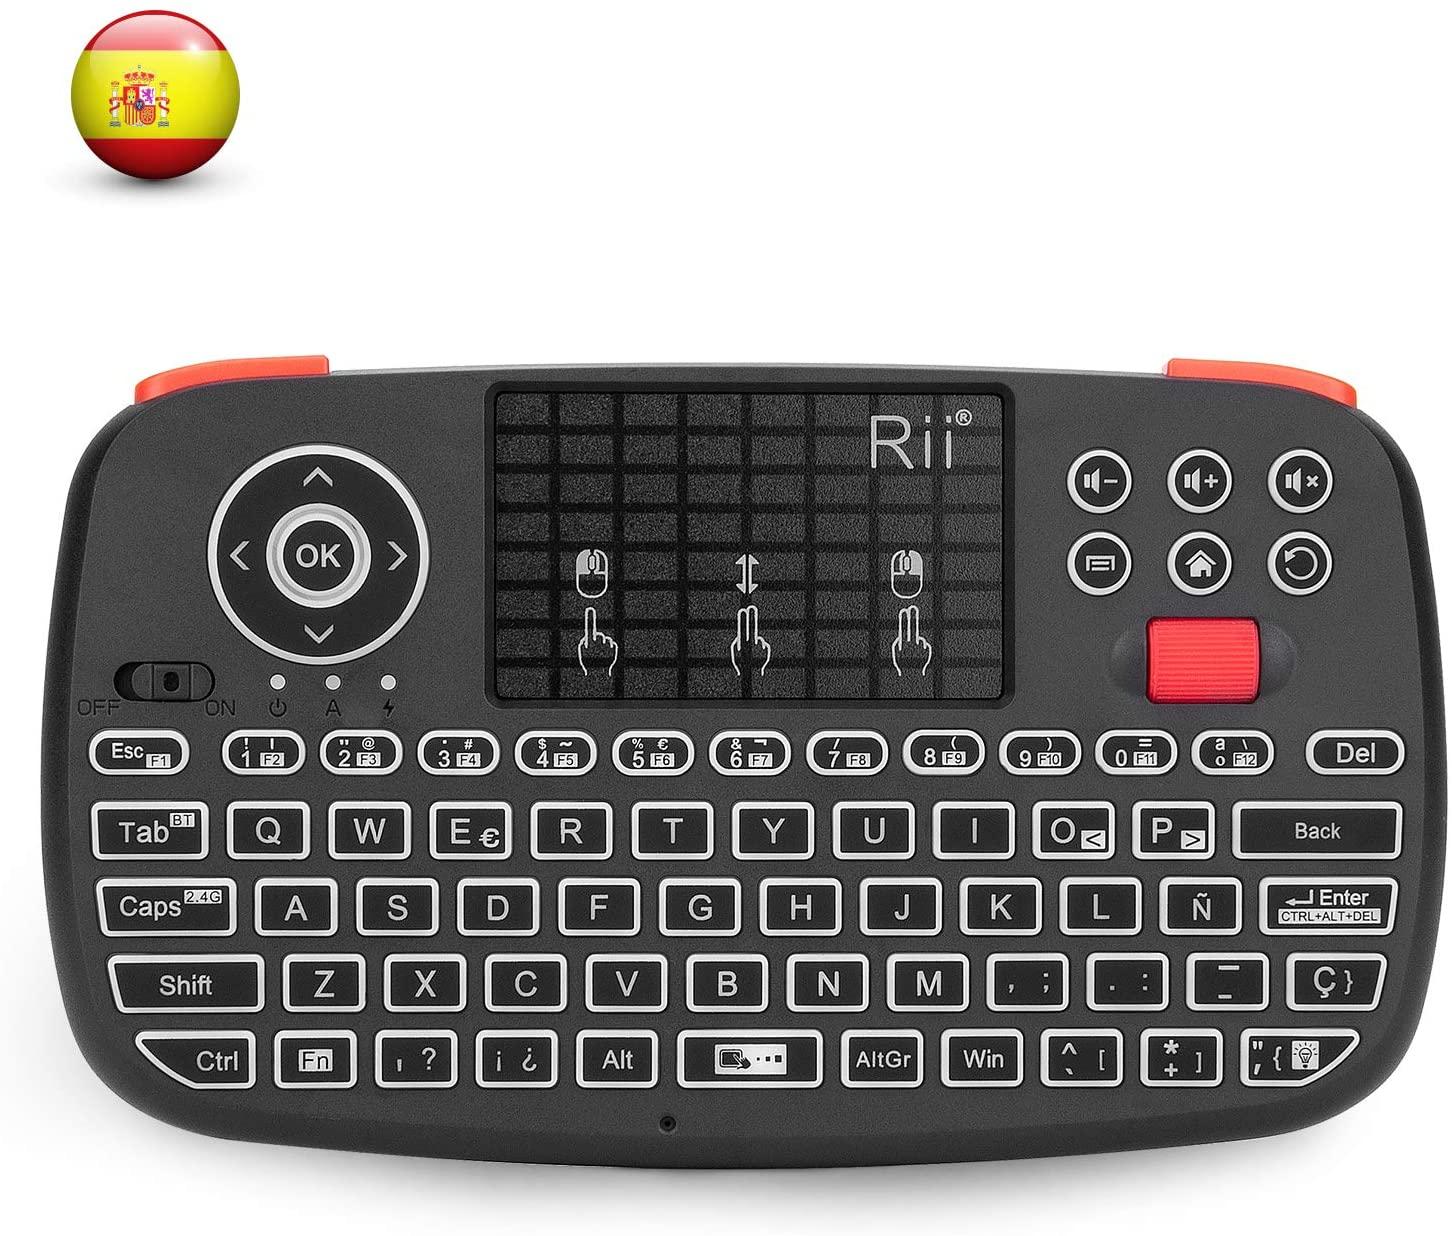 Rii i4 Mini bluetooth teclado inalámbrico retroiluminado, 2 en 1 (Bluetooth & Wireless 2.4 GHz), Qwerty español, para iOS, Android,Windows